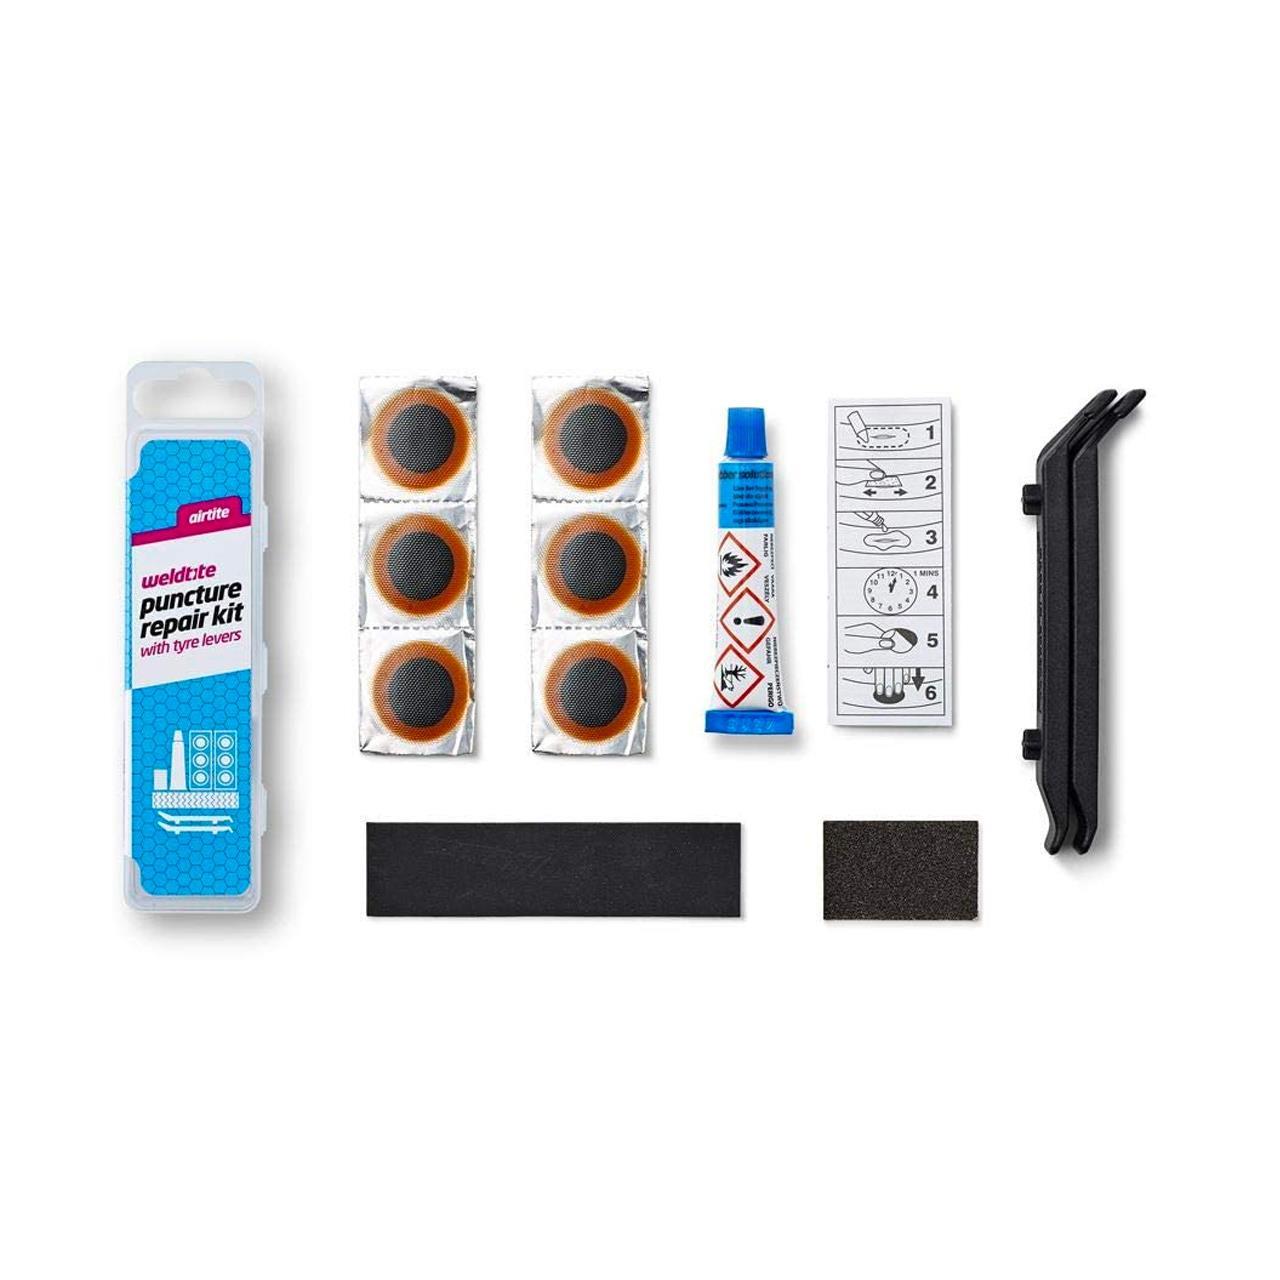 Weldtite Puncture repair kit & Tools